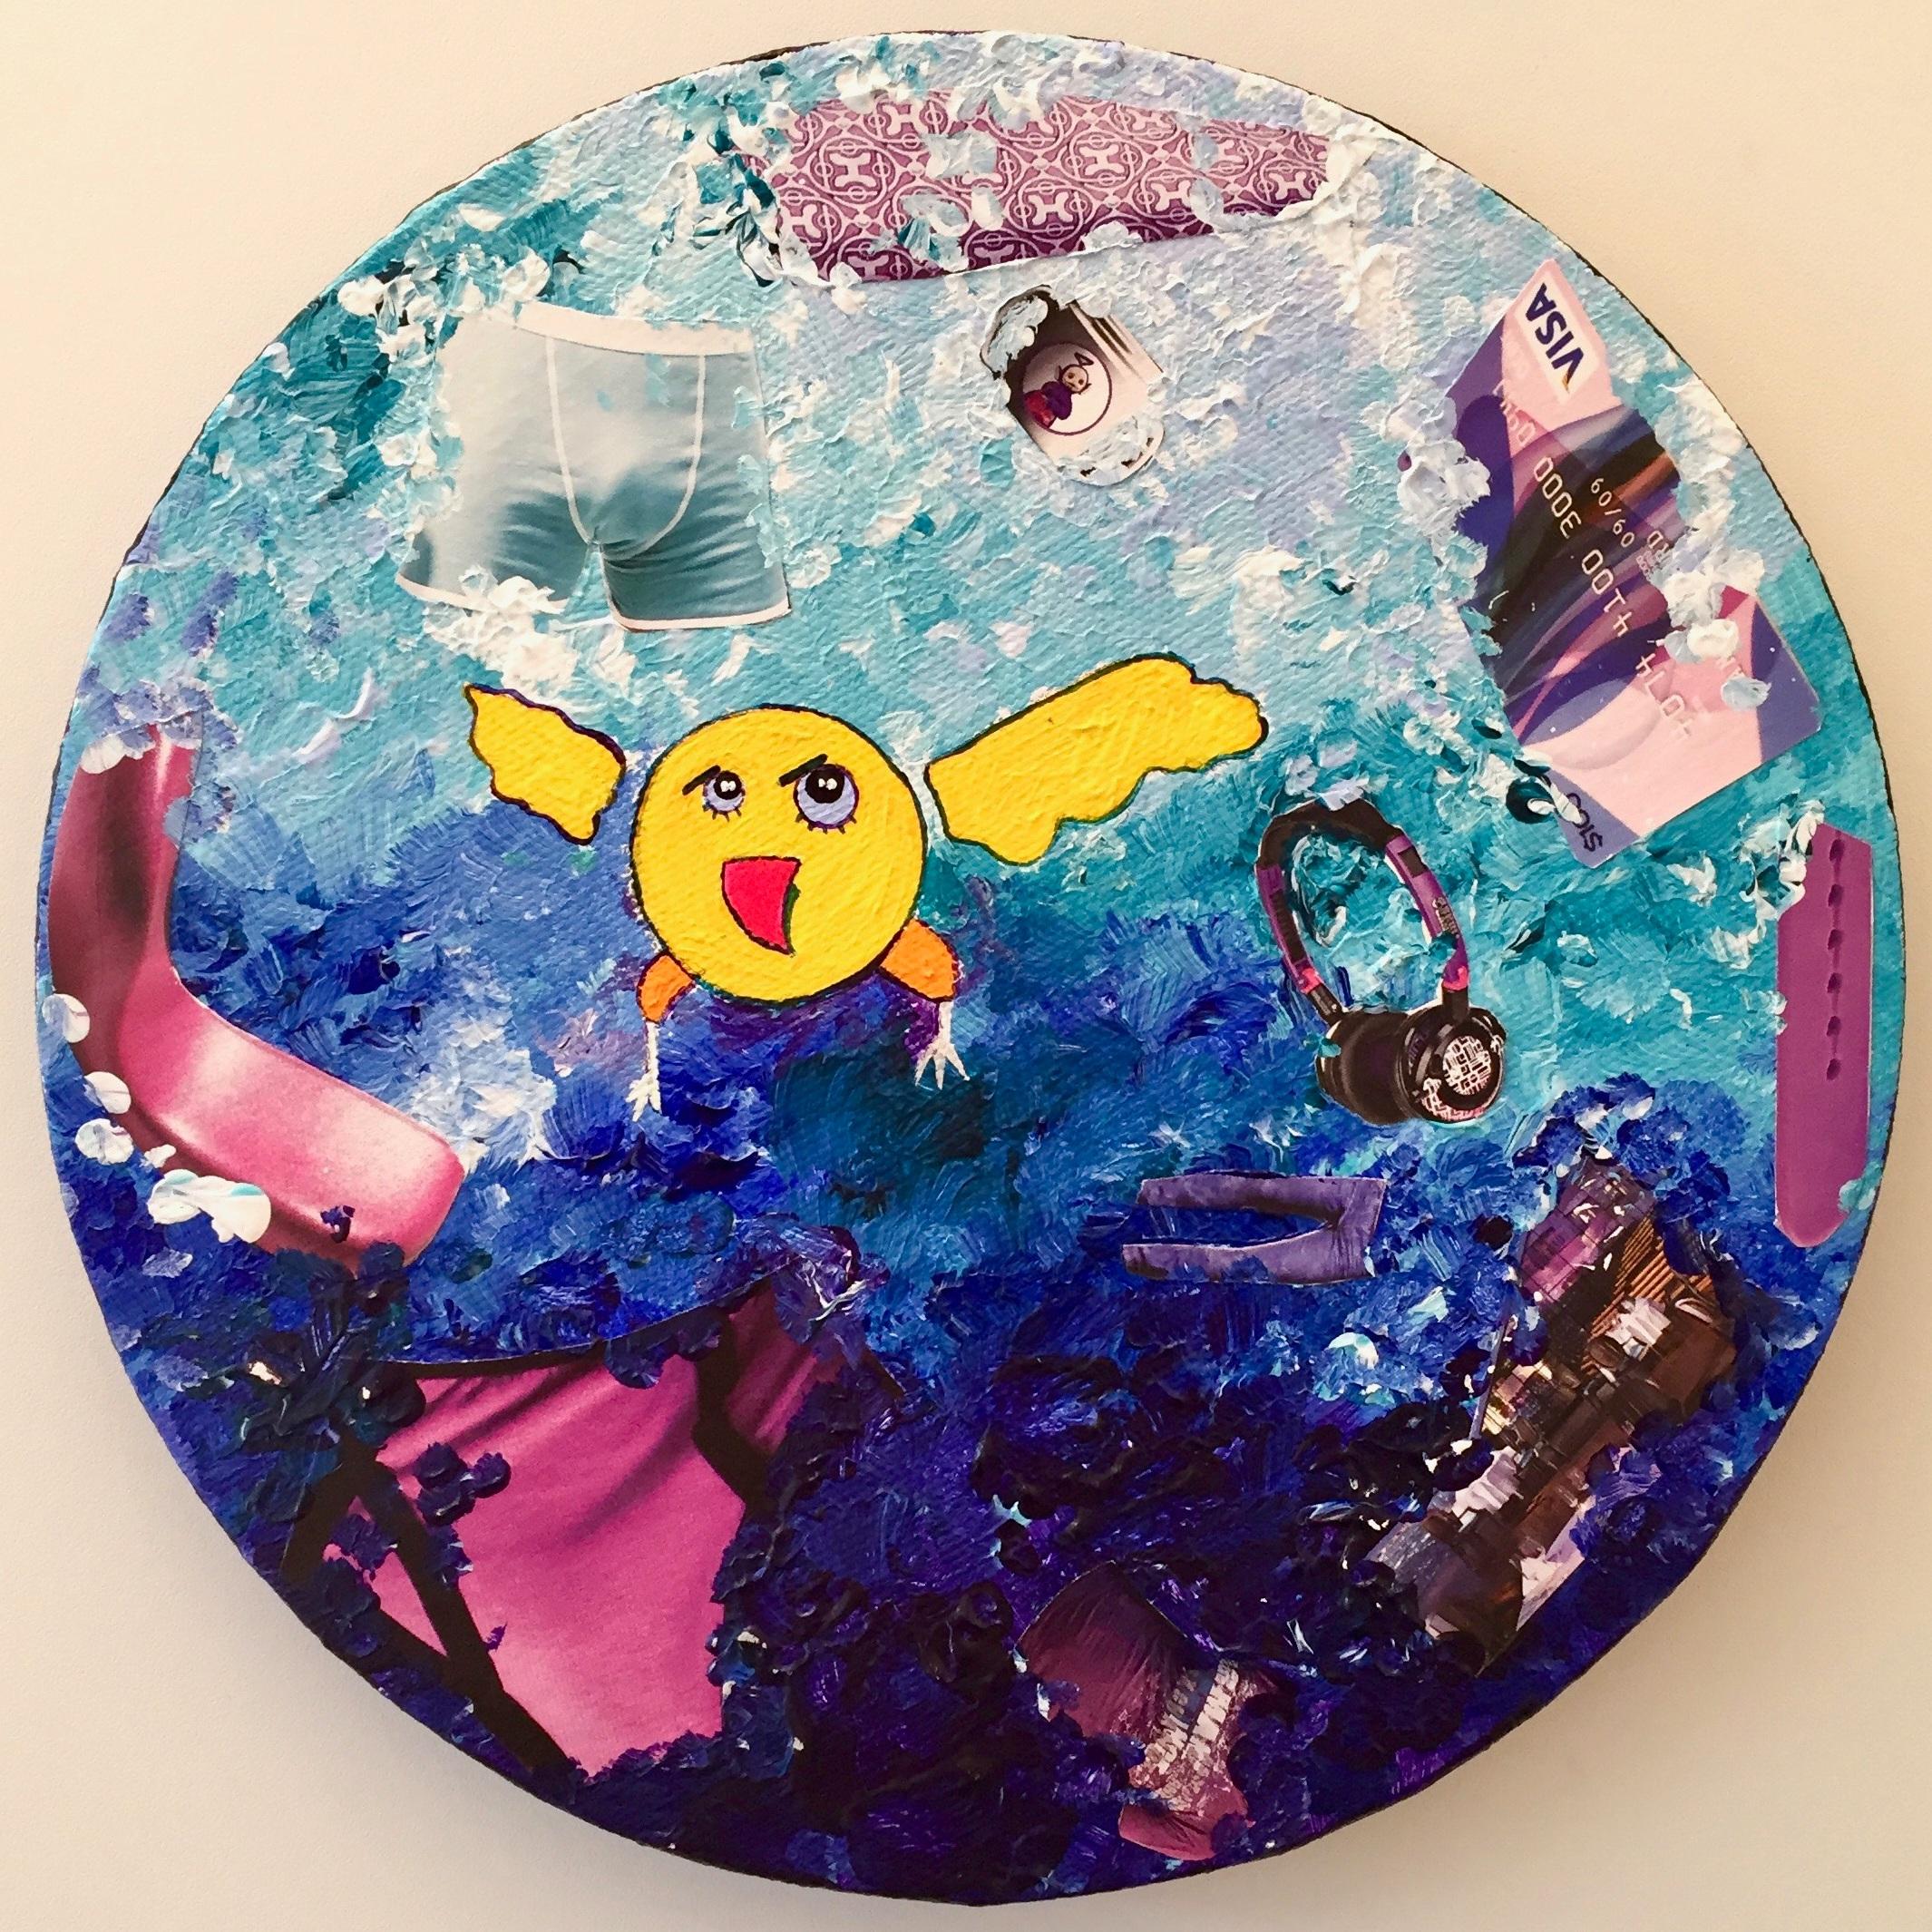 Shopping spree SMAYbird  2013 Mixed media on canvas 20cm diameter